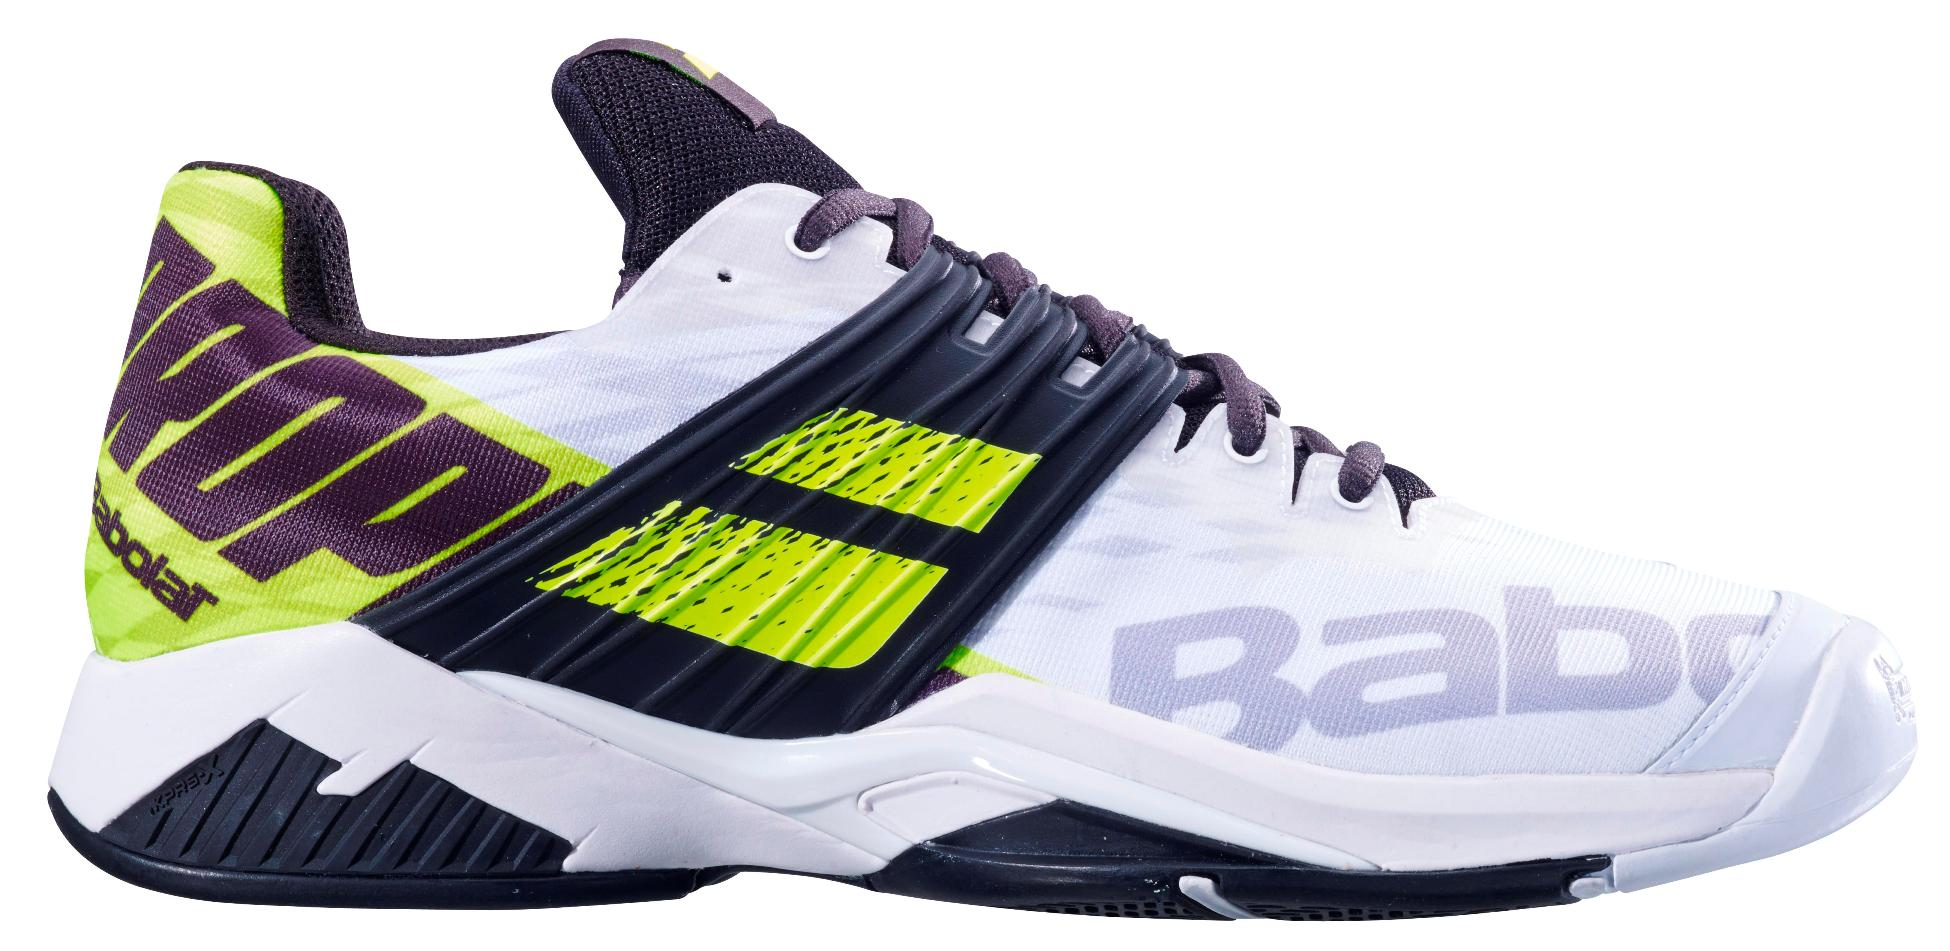 Теннисные кроссовки Babolat Propulse Fury All Court Black/White/Yellow (42) Propulse Fury All Court по цене 10 499